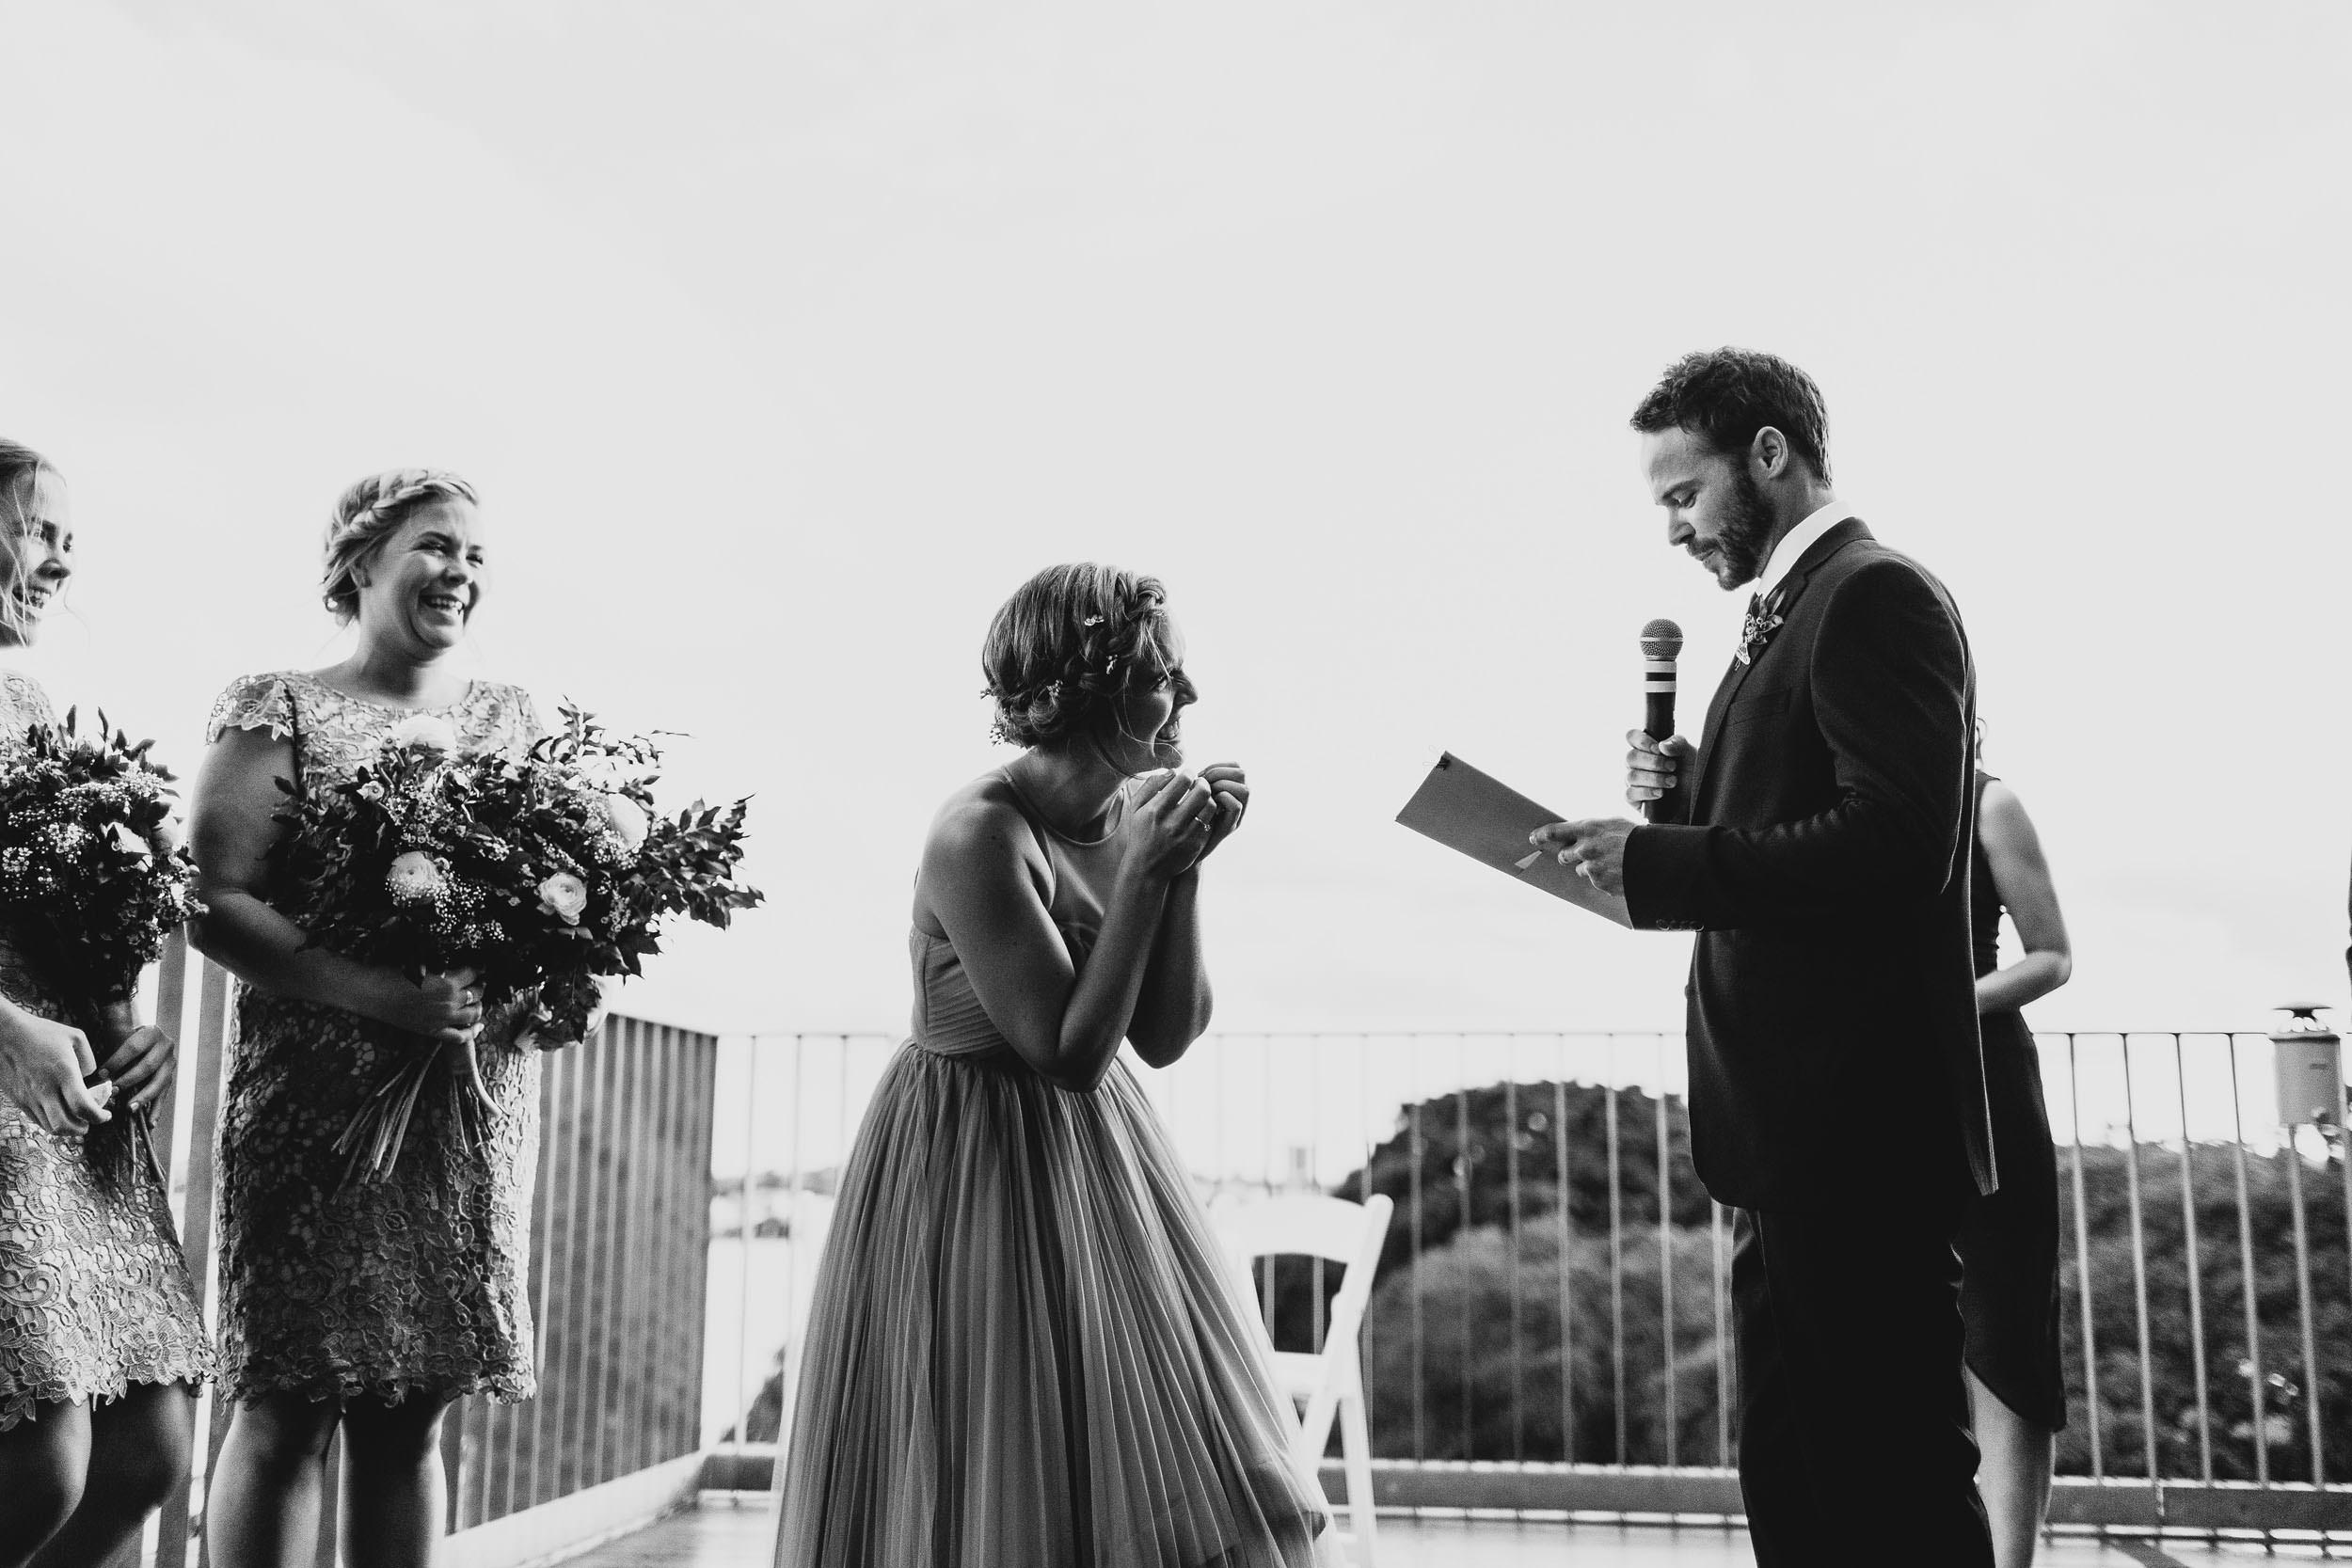 079_power_house_wedding_finch_and_oak.jpg